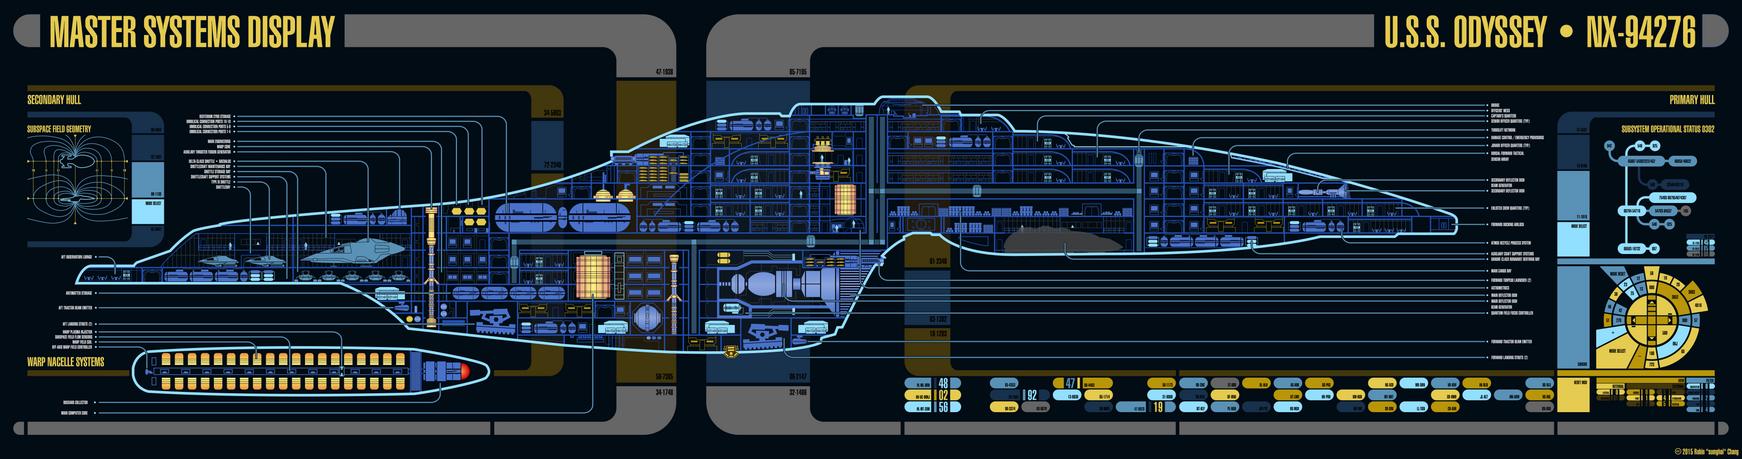 USS Odyssey (NX-94276) - Master Systems Display by sumghai